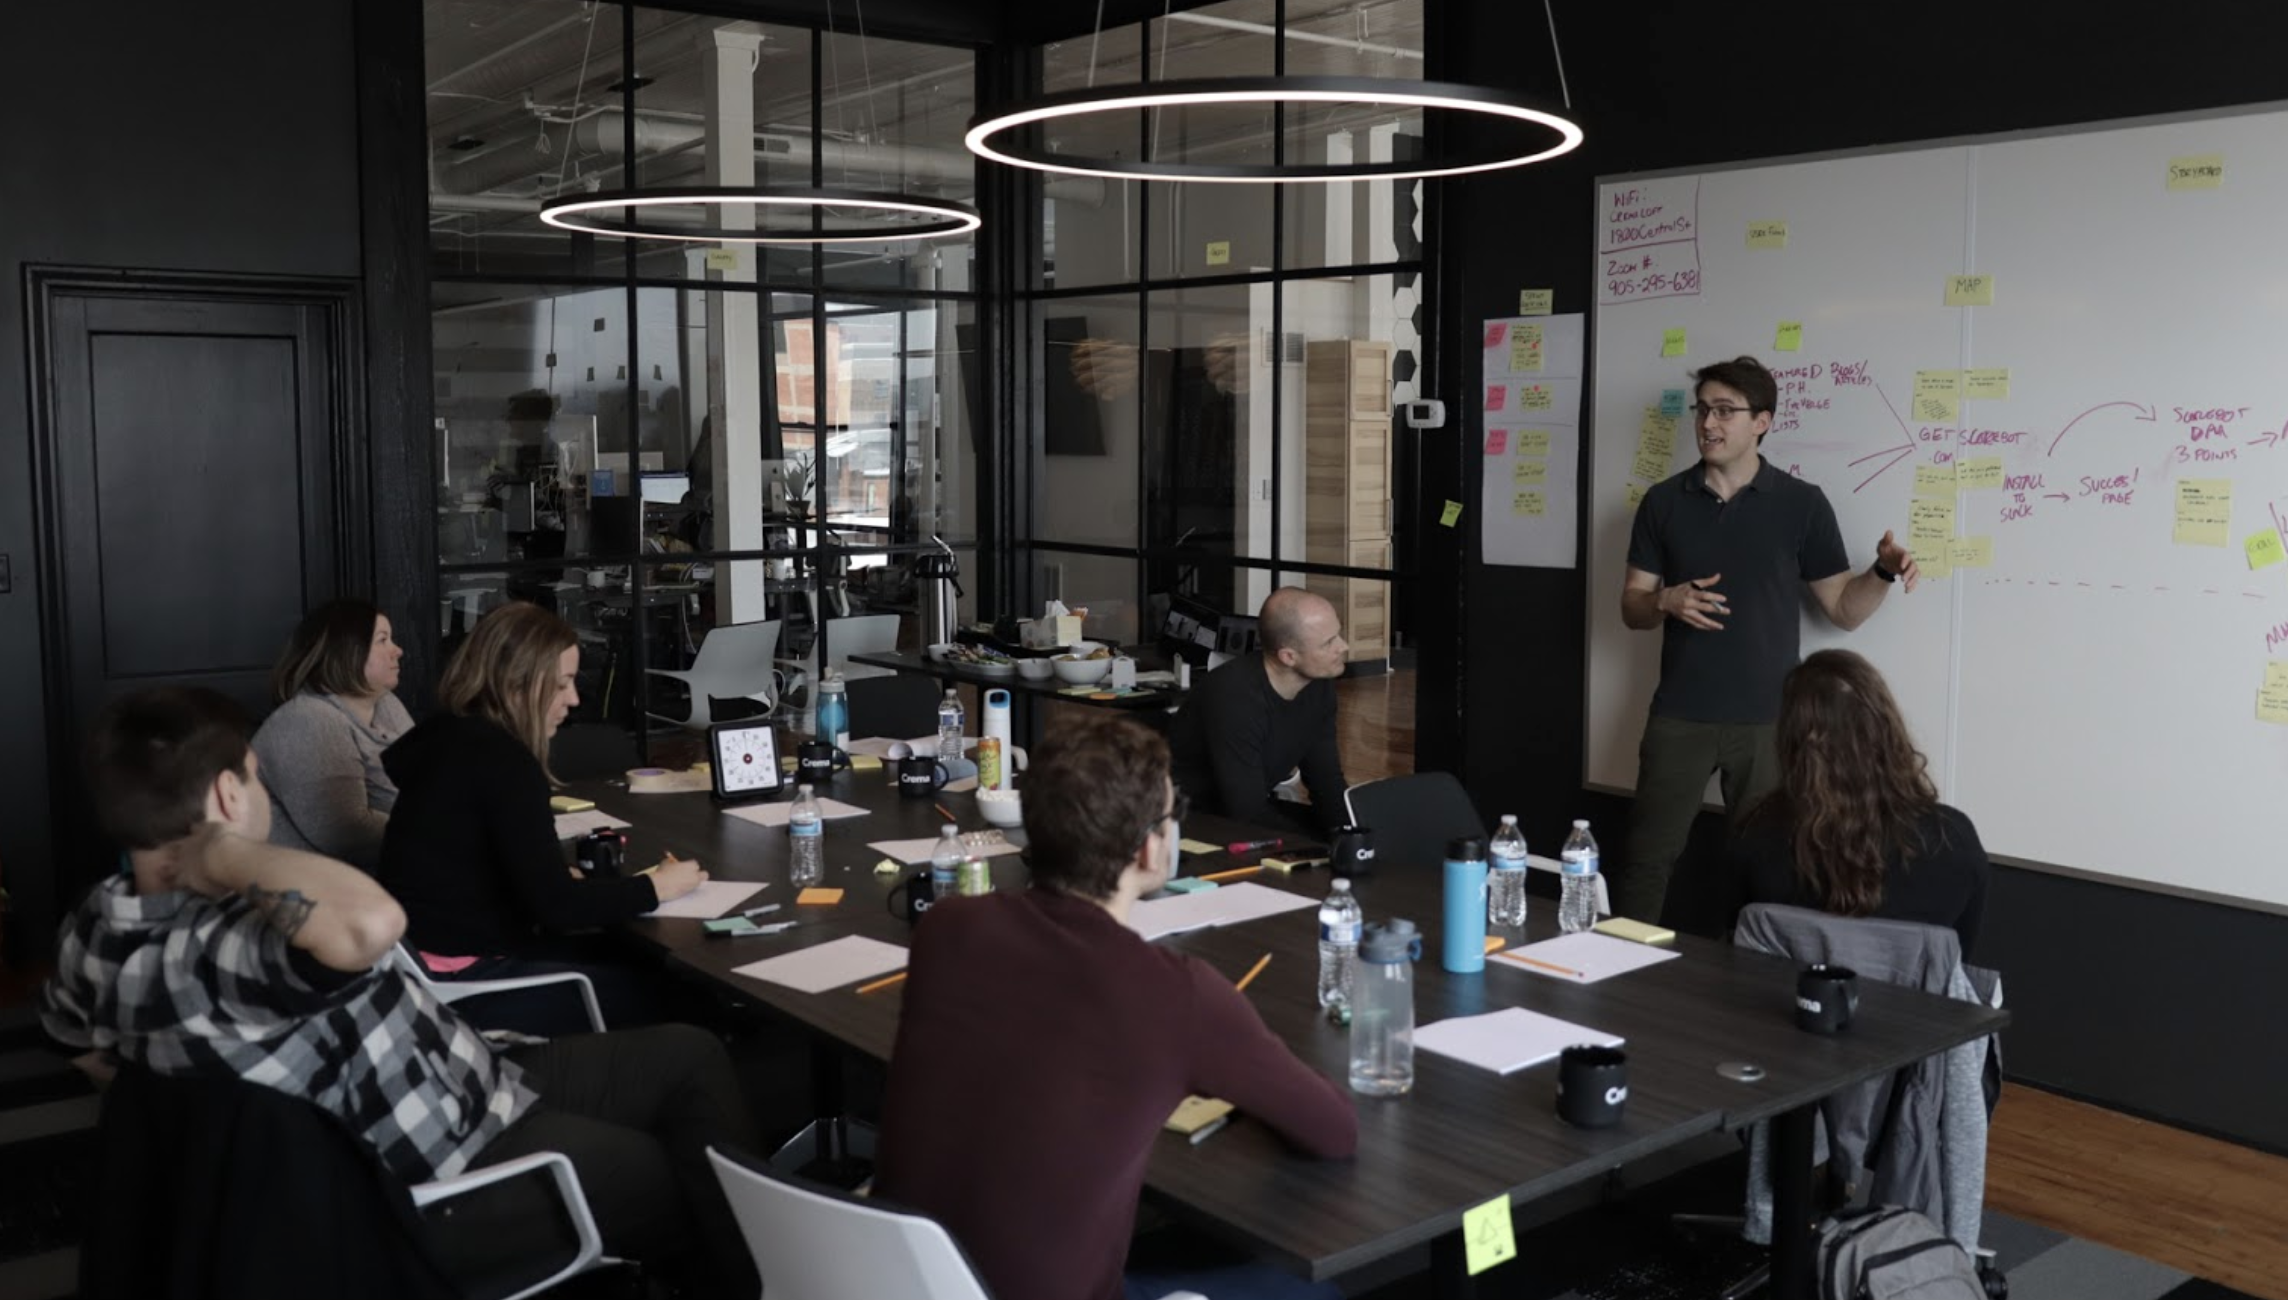 man facilitating design sprint at front of room